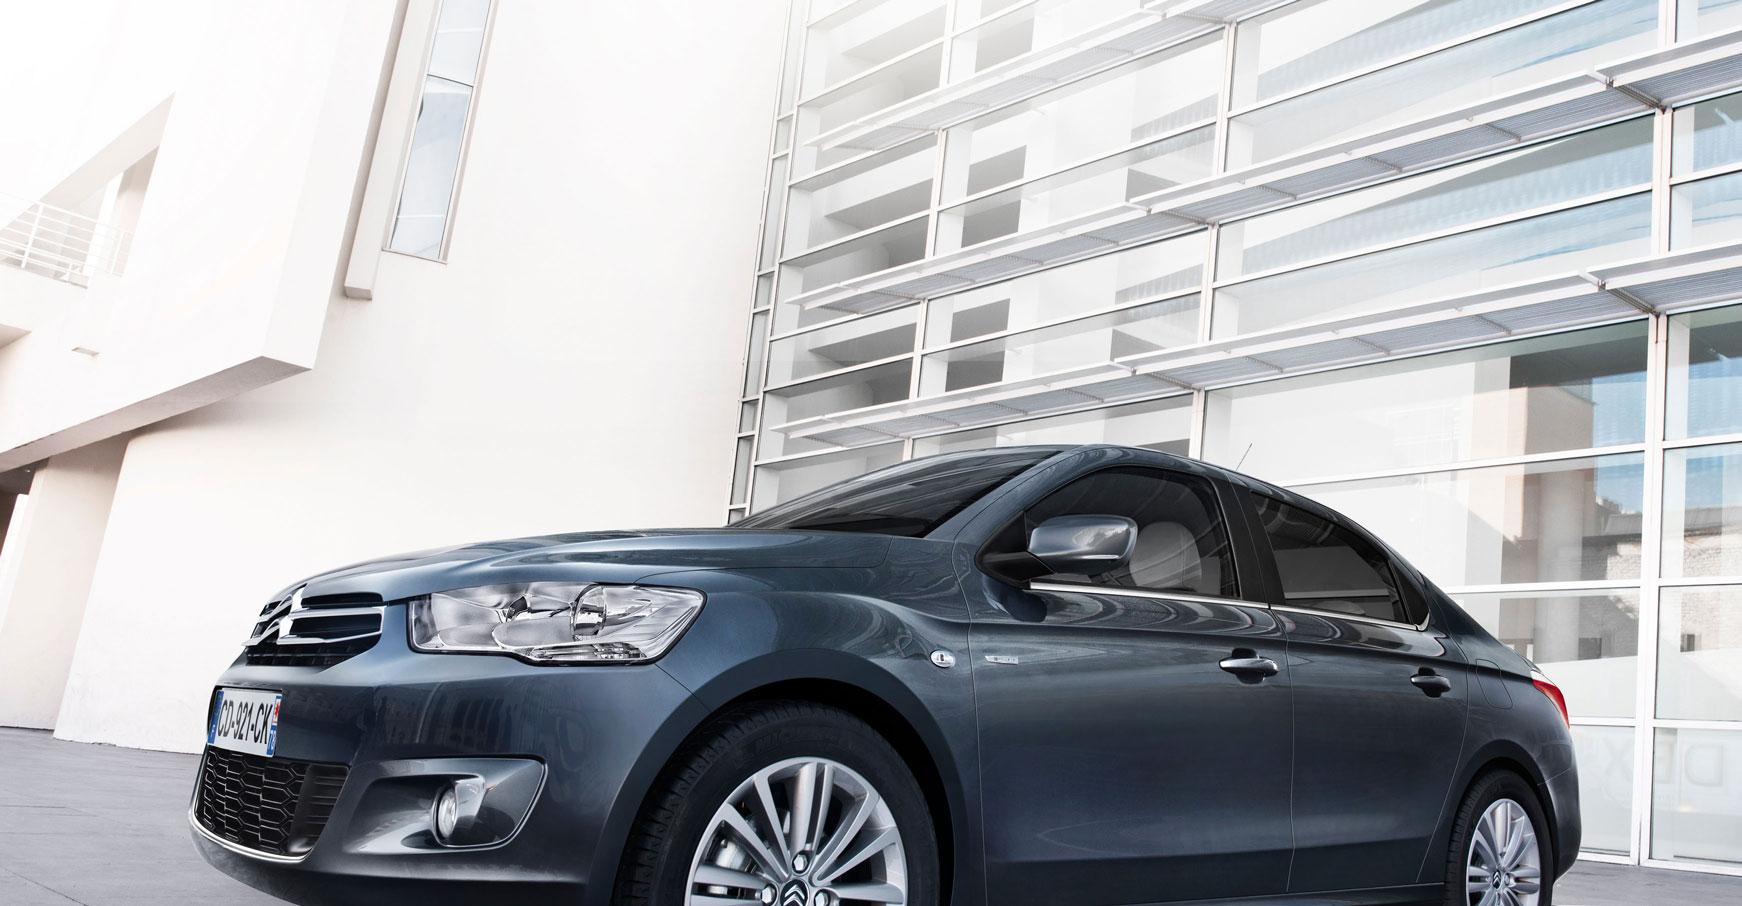 Foto Exteriores Citroen C Elysee Sedan 2012